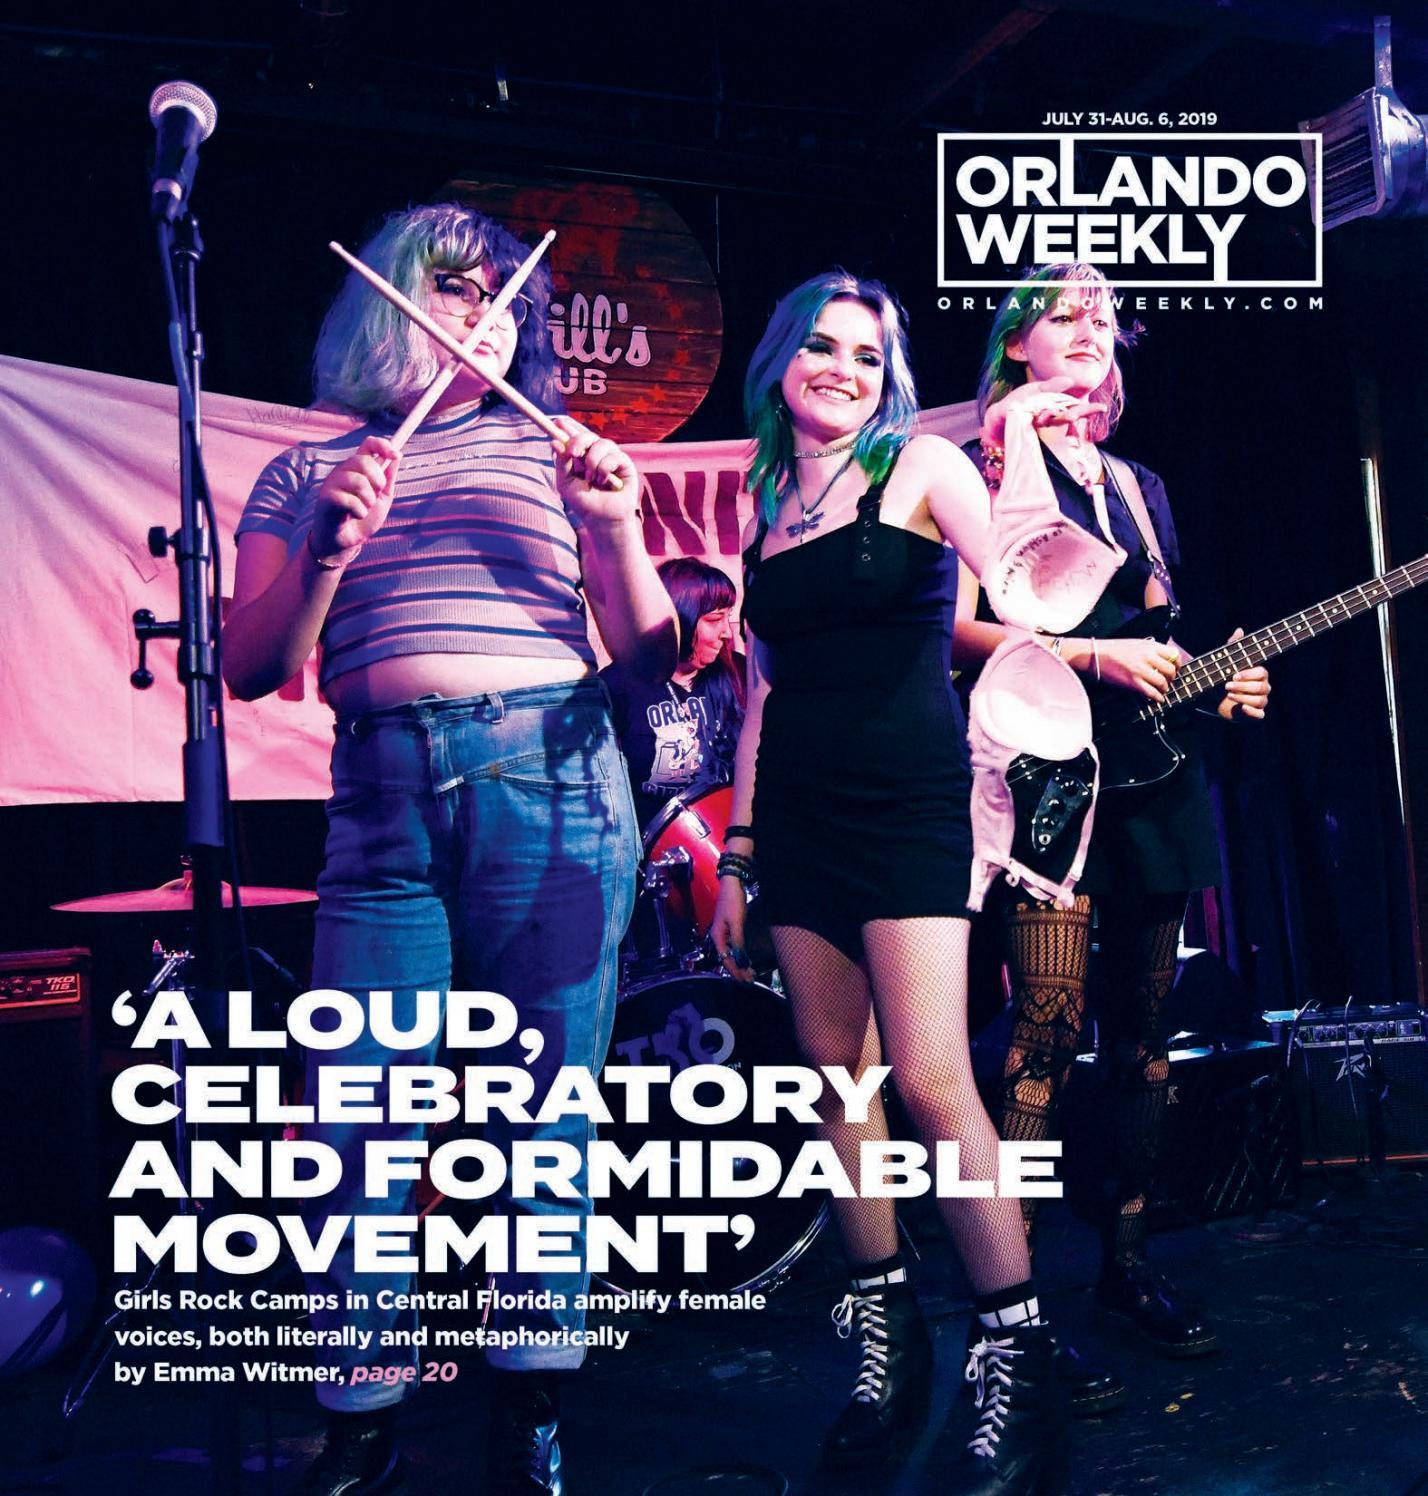 Orlando Weekly July 31, 2019 by Euclid Media Group - issuu